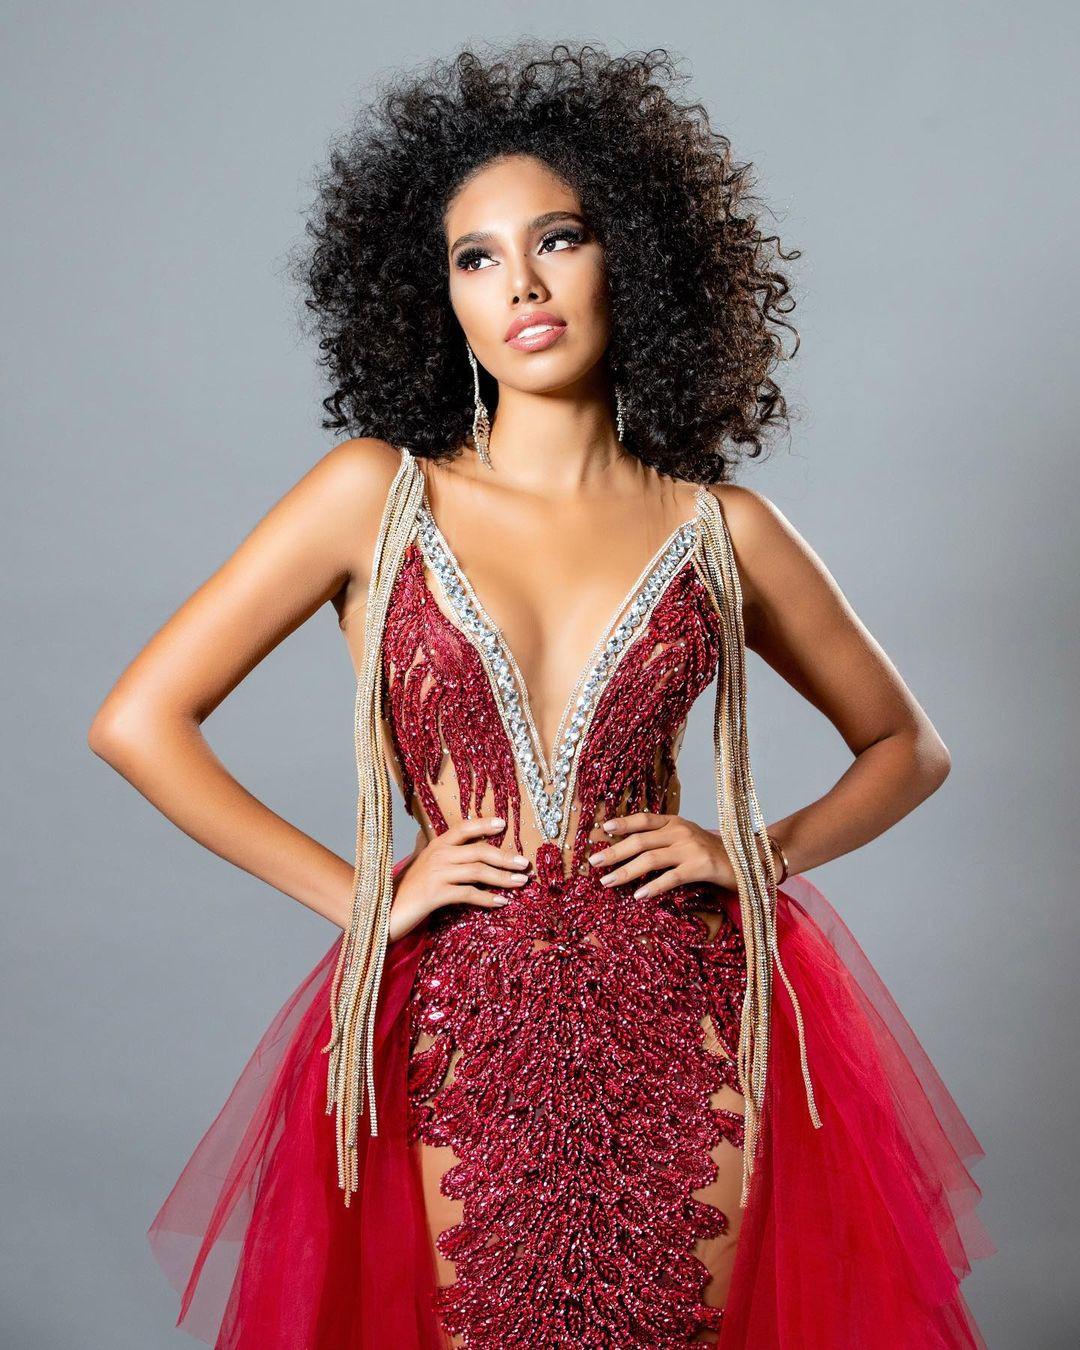 priscila moreno, top 2 de top model of the world 2021. - Página 7 Fbuidb10